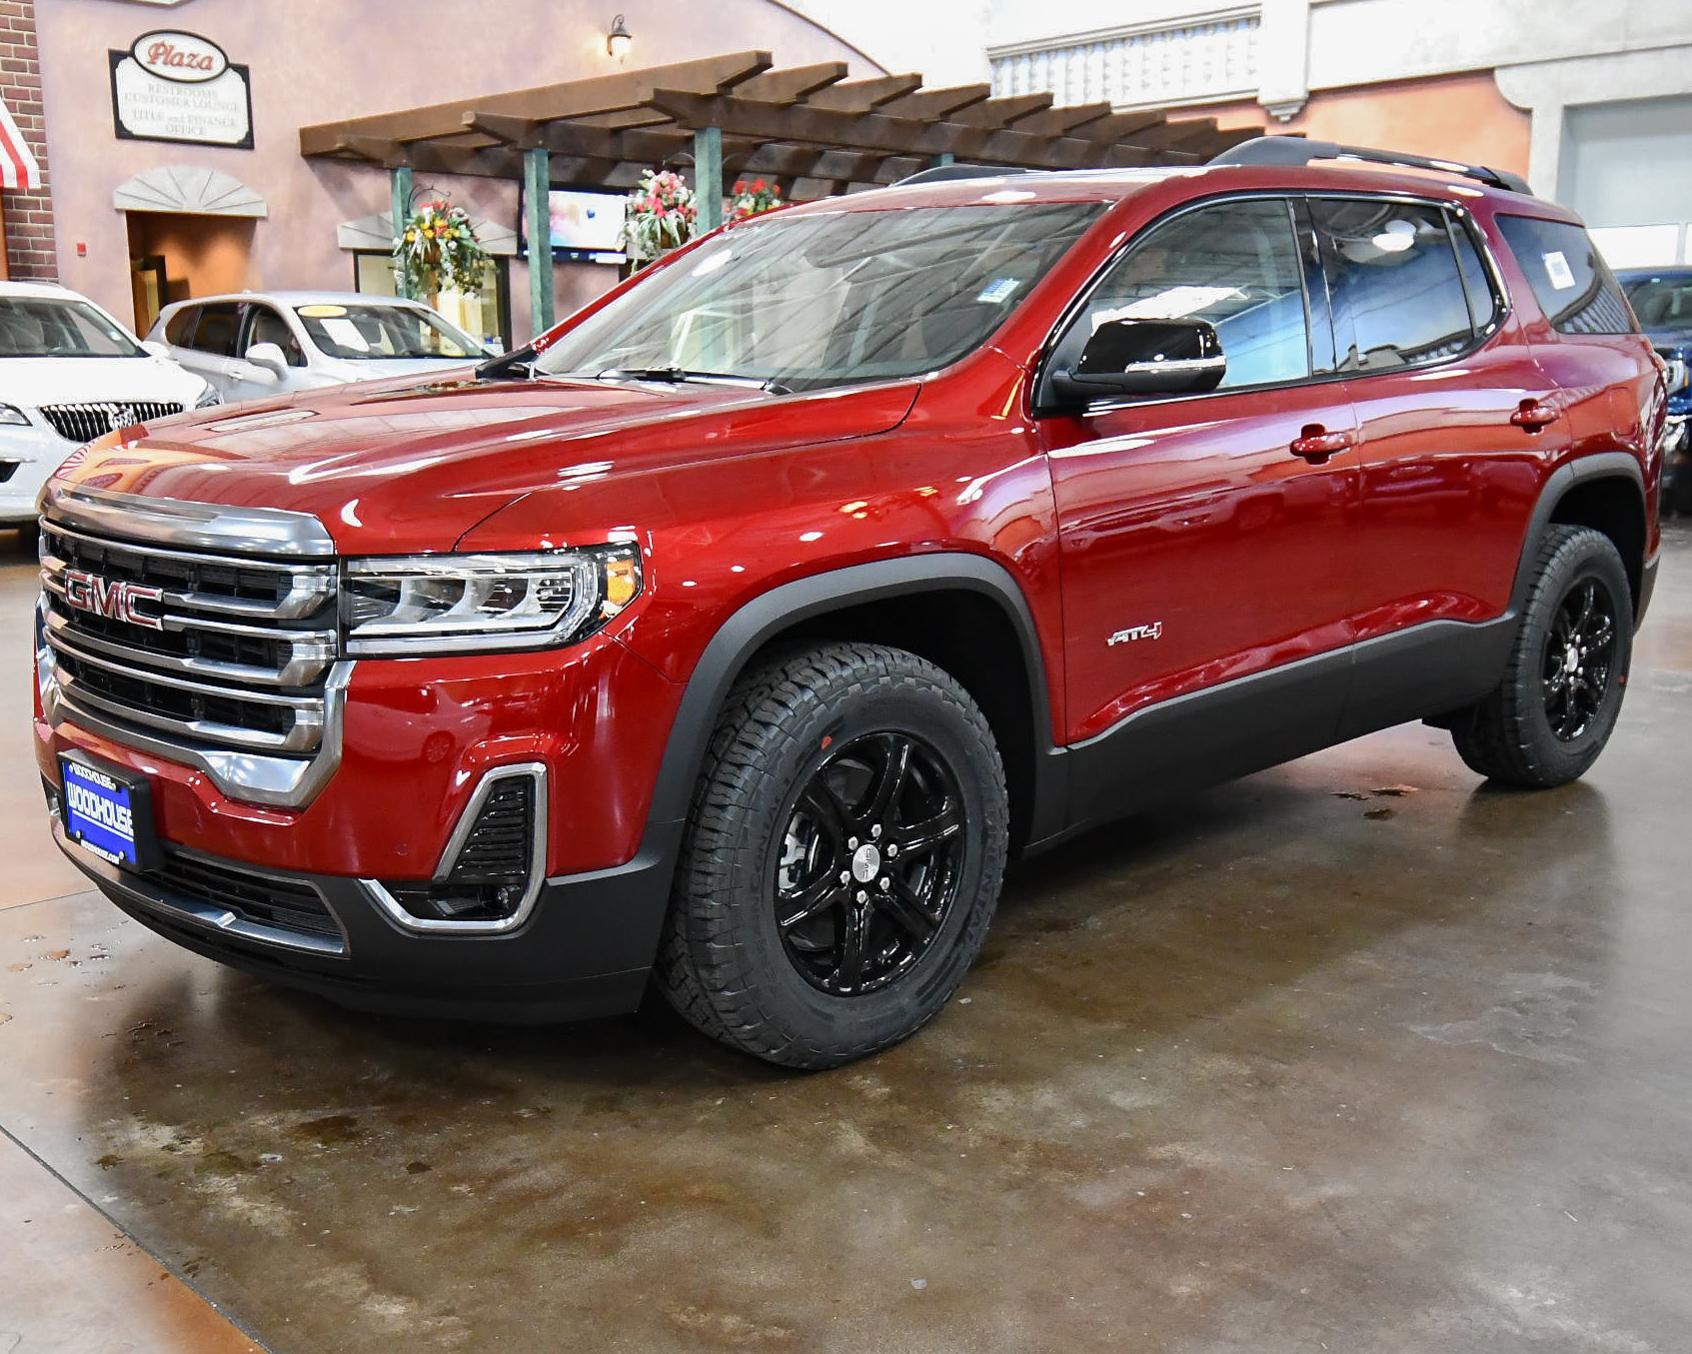 Woodhouse New 2021 Gmc Acadia For Sale Buick Gmc Omaha